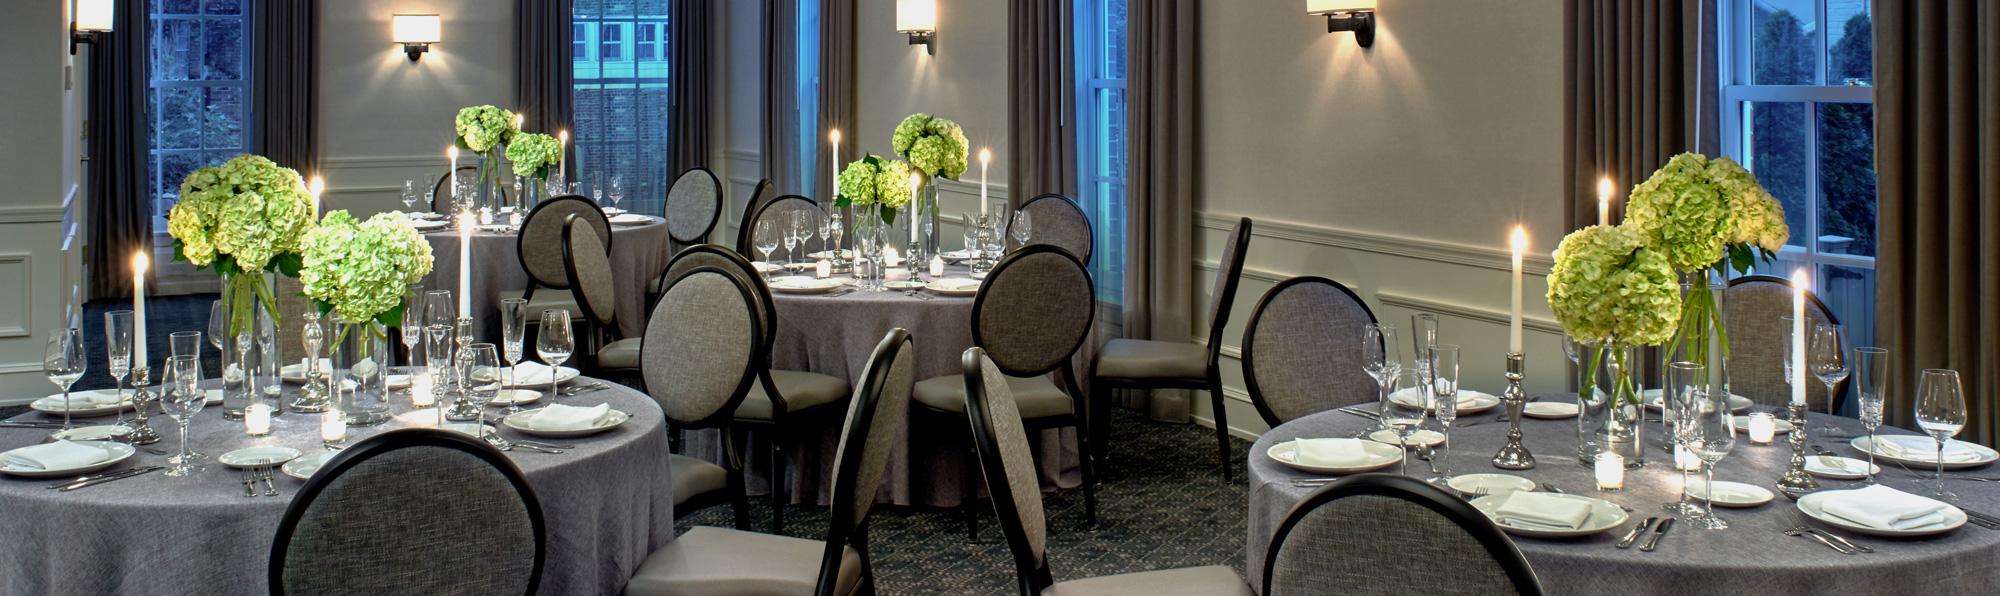 Food & Beverage, Intimate, Wedding, Venue, Space, Alexandria, VA